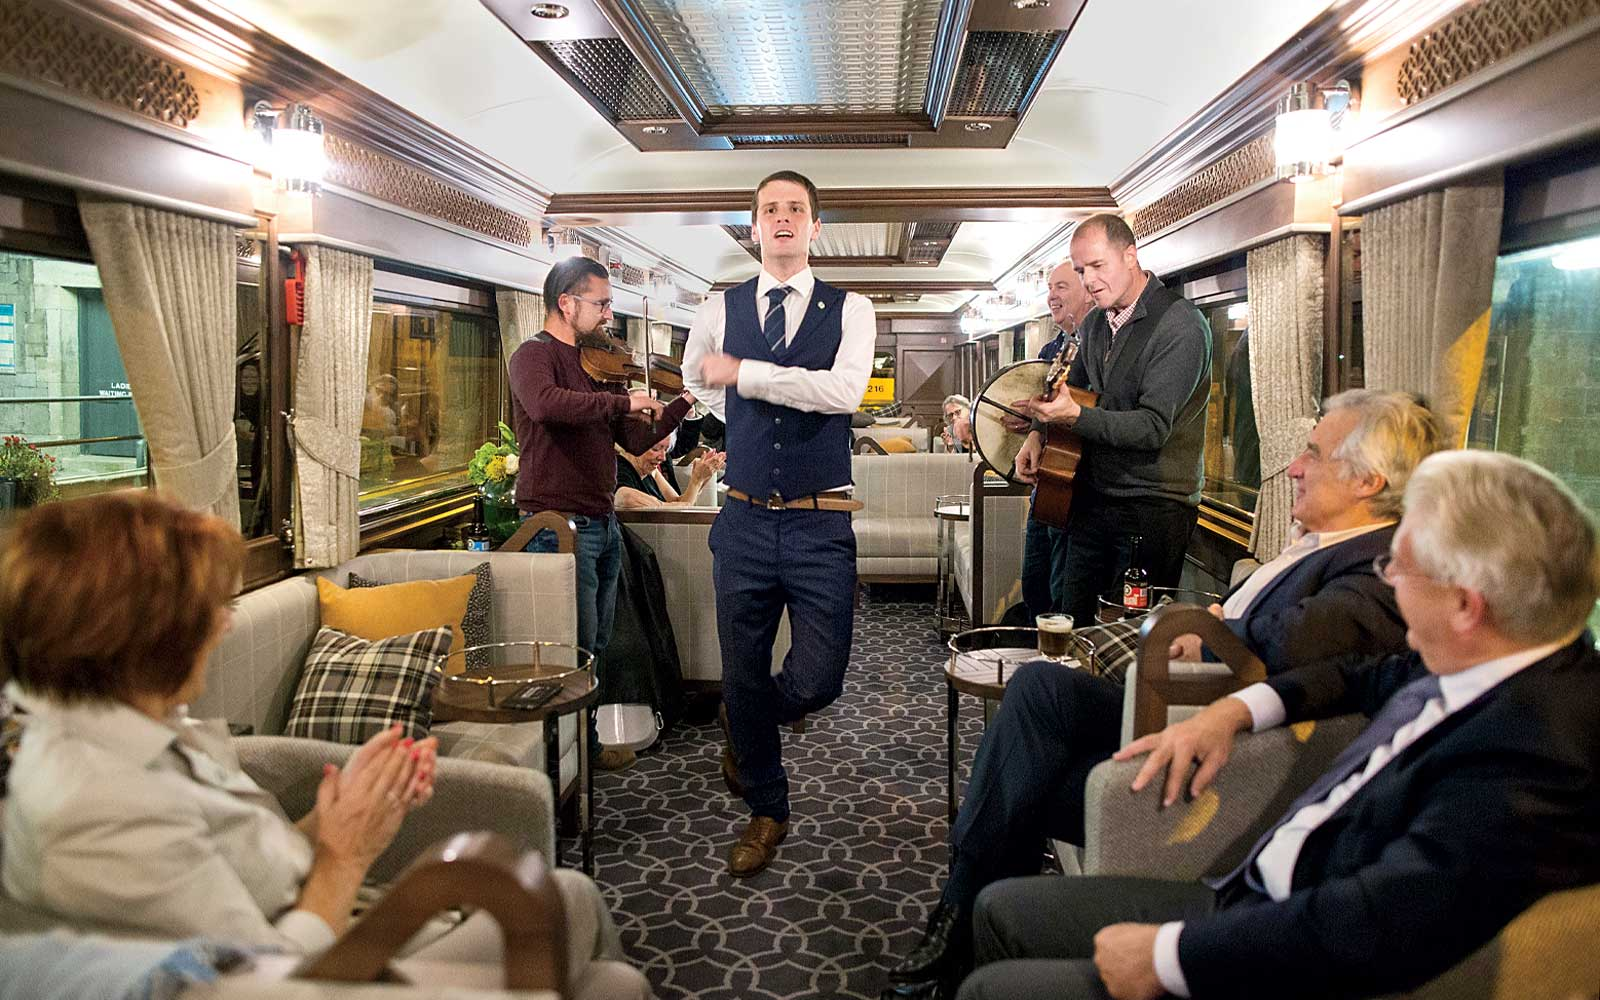 irish-jig-belmond-grand-hibernian-train-BUCKETTRAIN1117